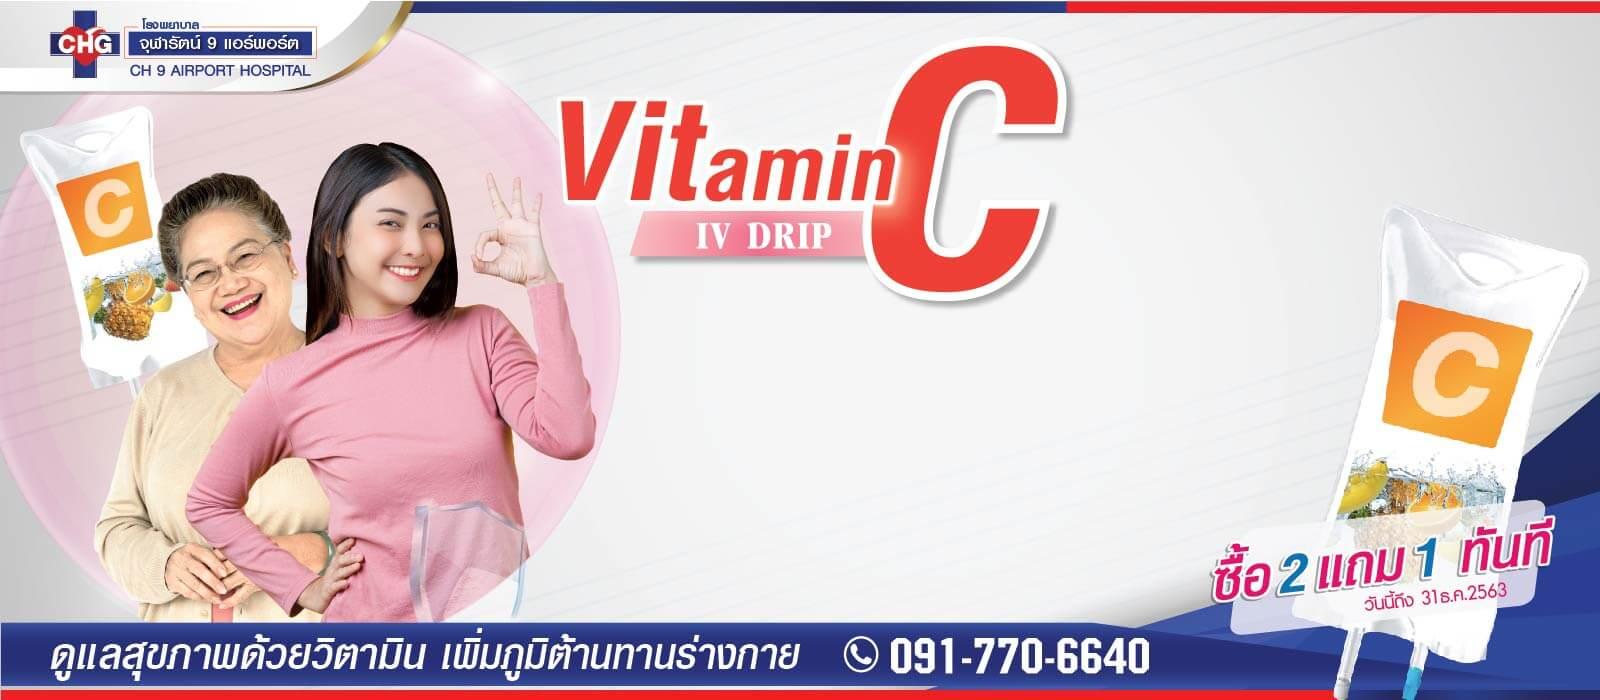 6304-banner-vitc-1